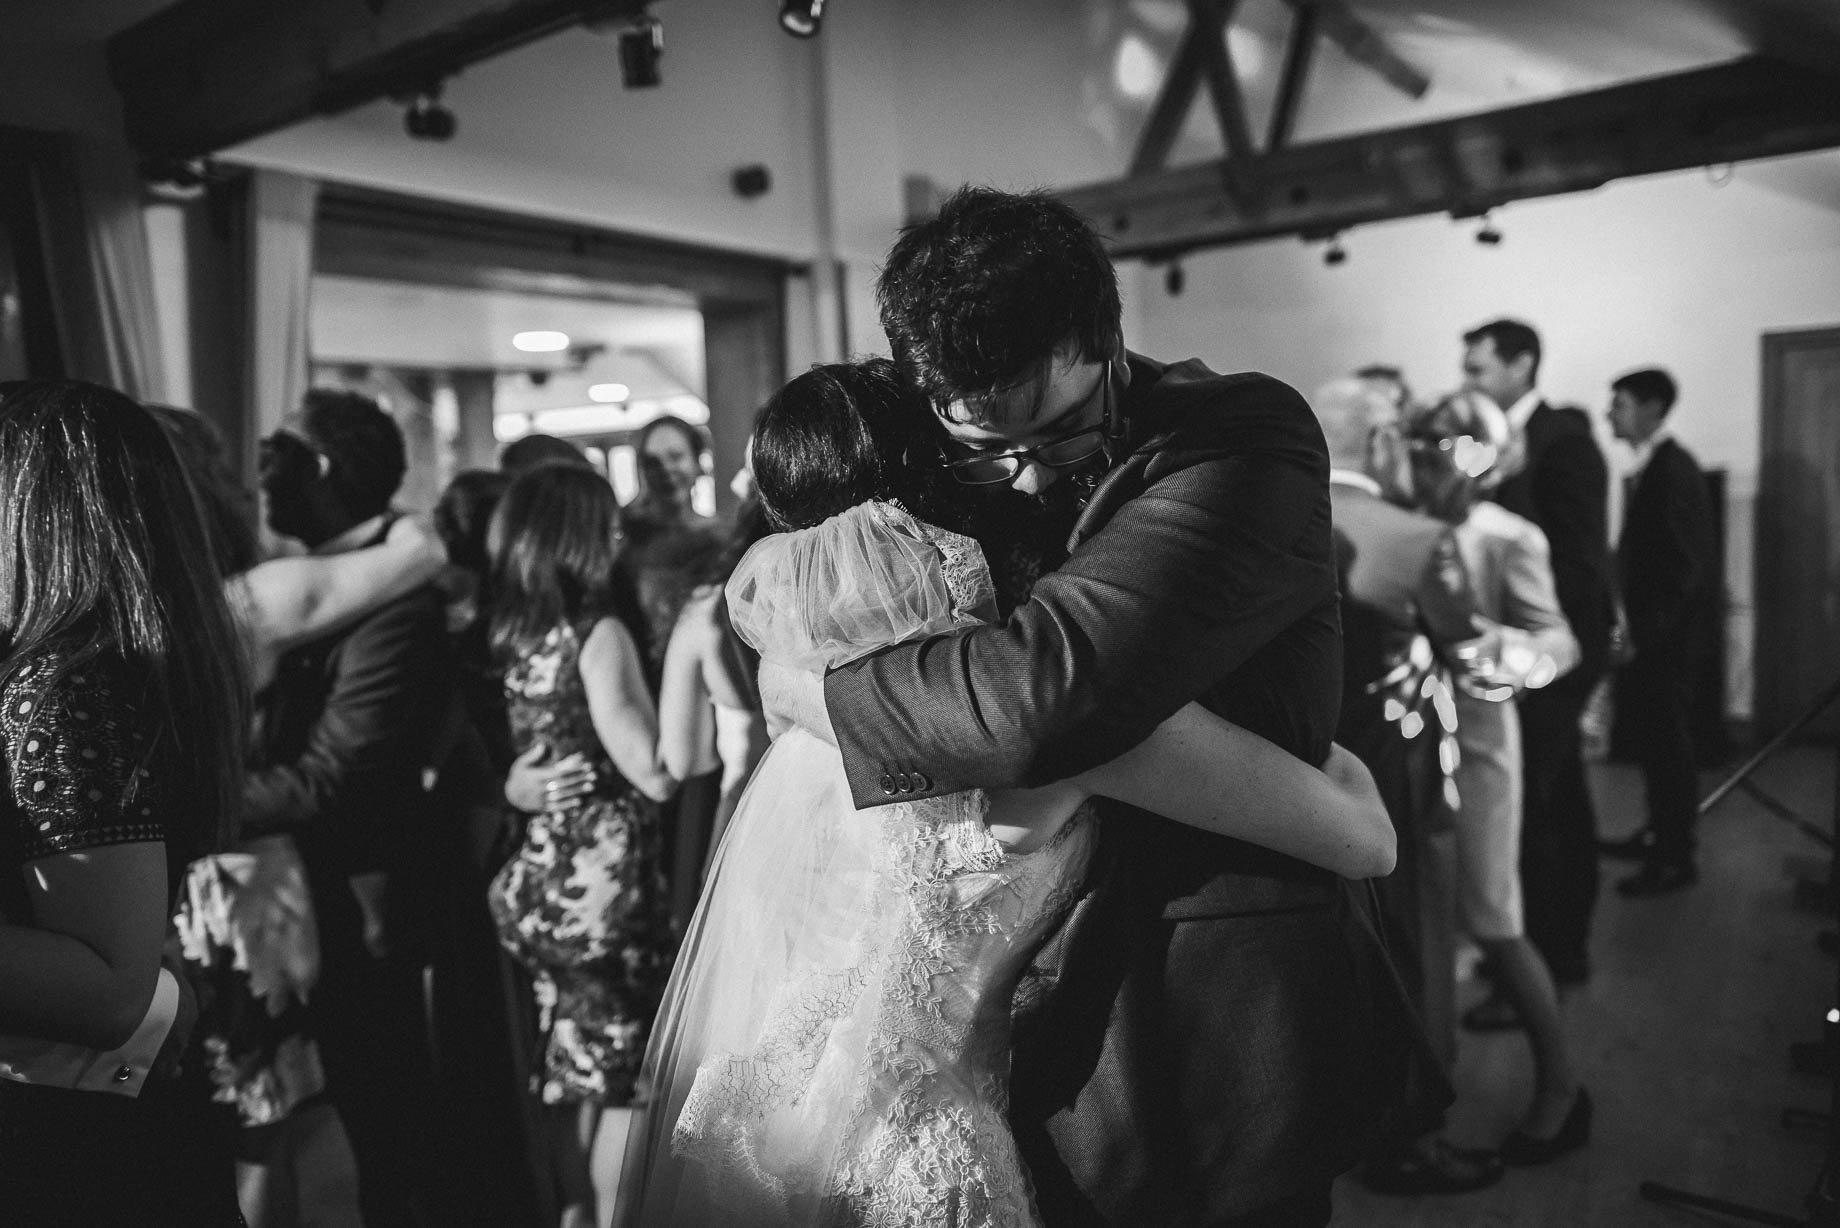 Gaynes Park wedding photography - Guy Collier Photography - Rachel and Jon (169 of 169)